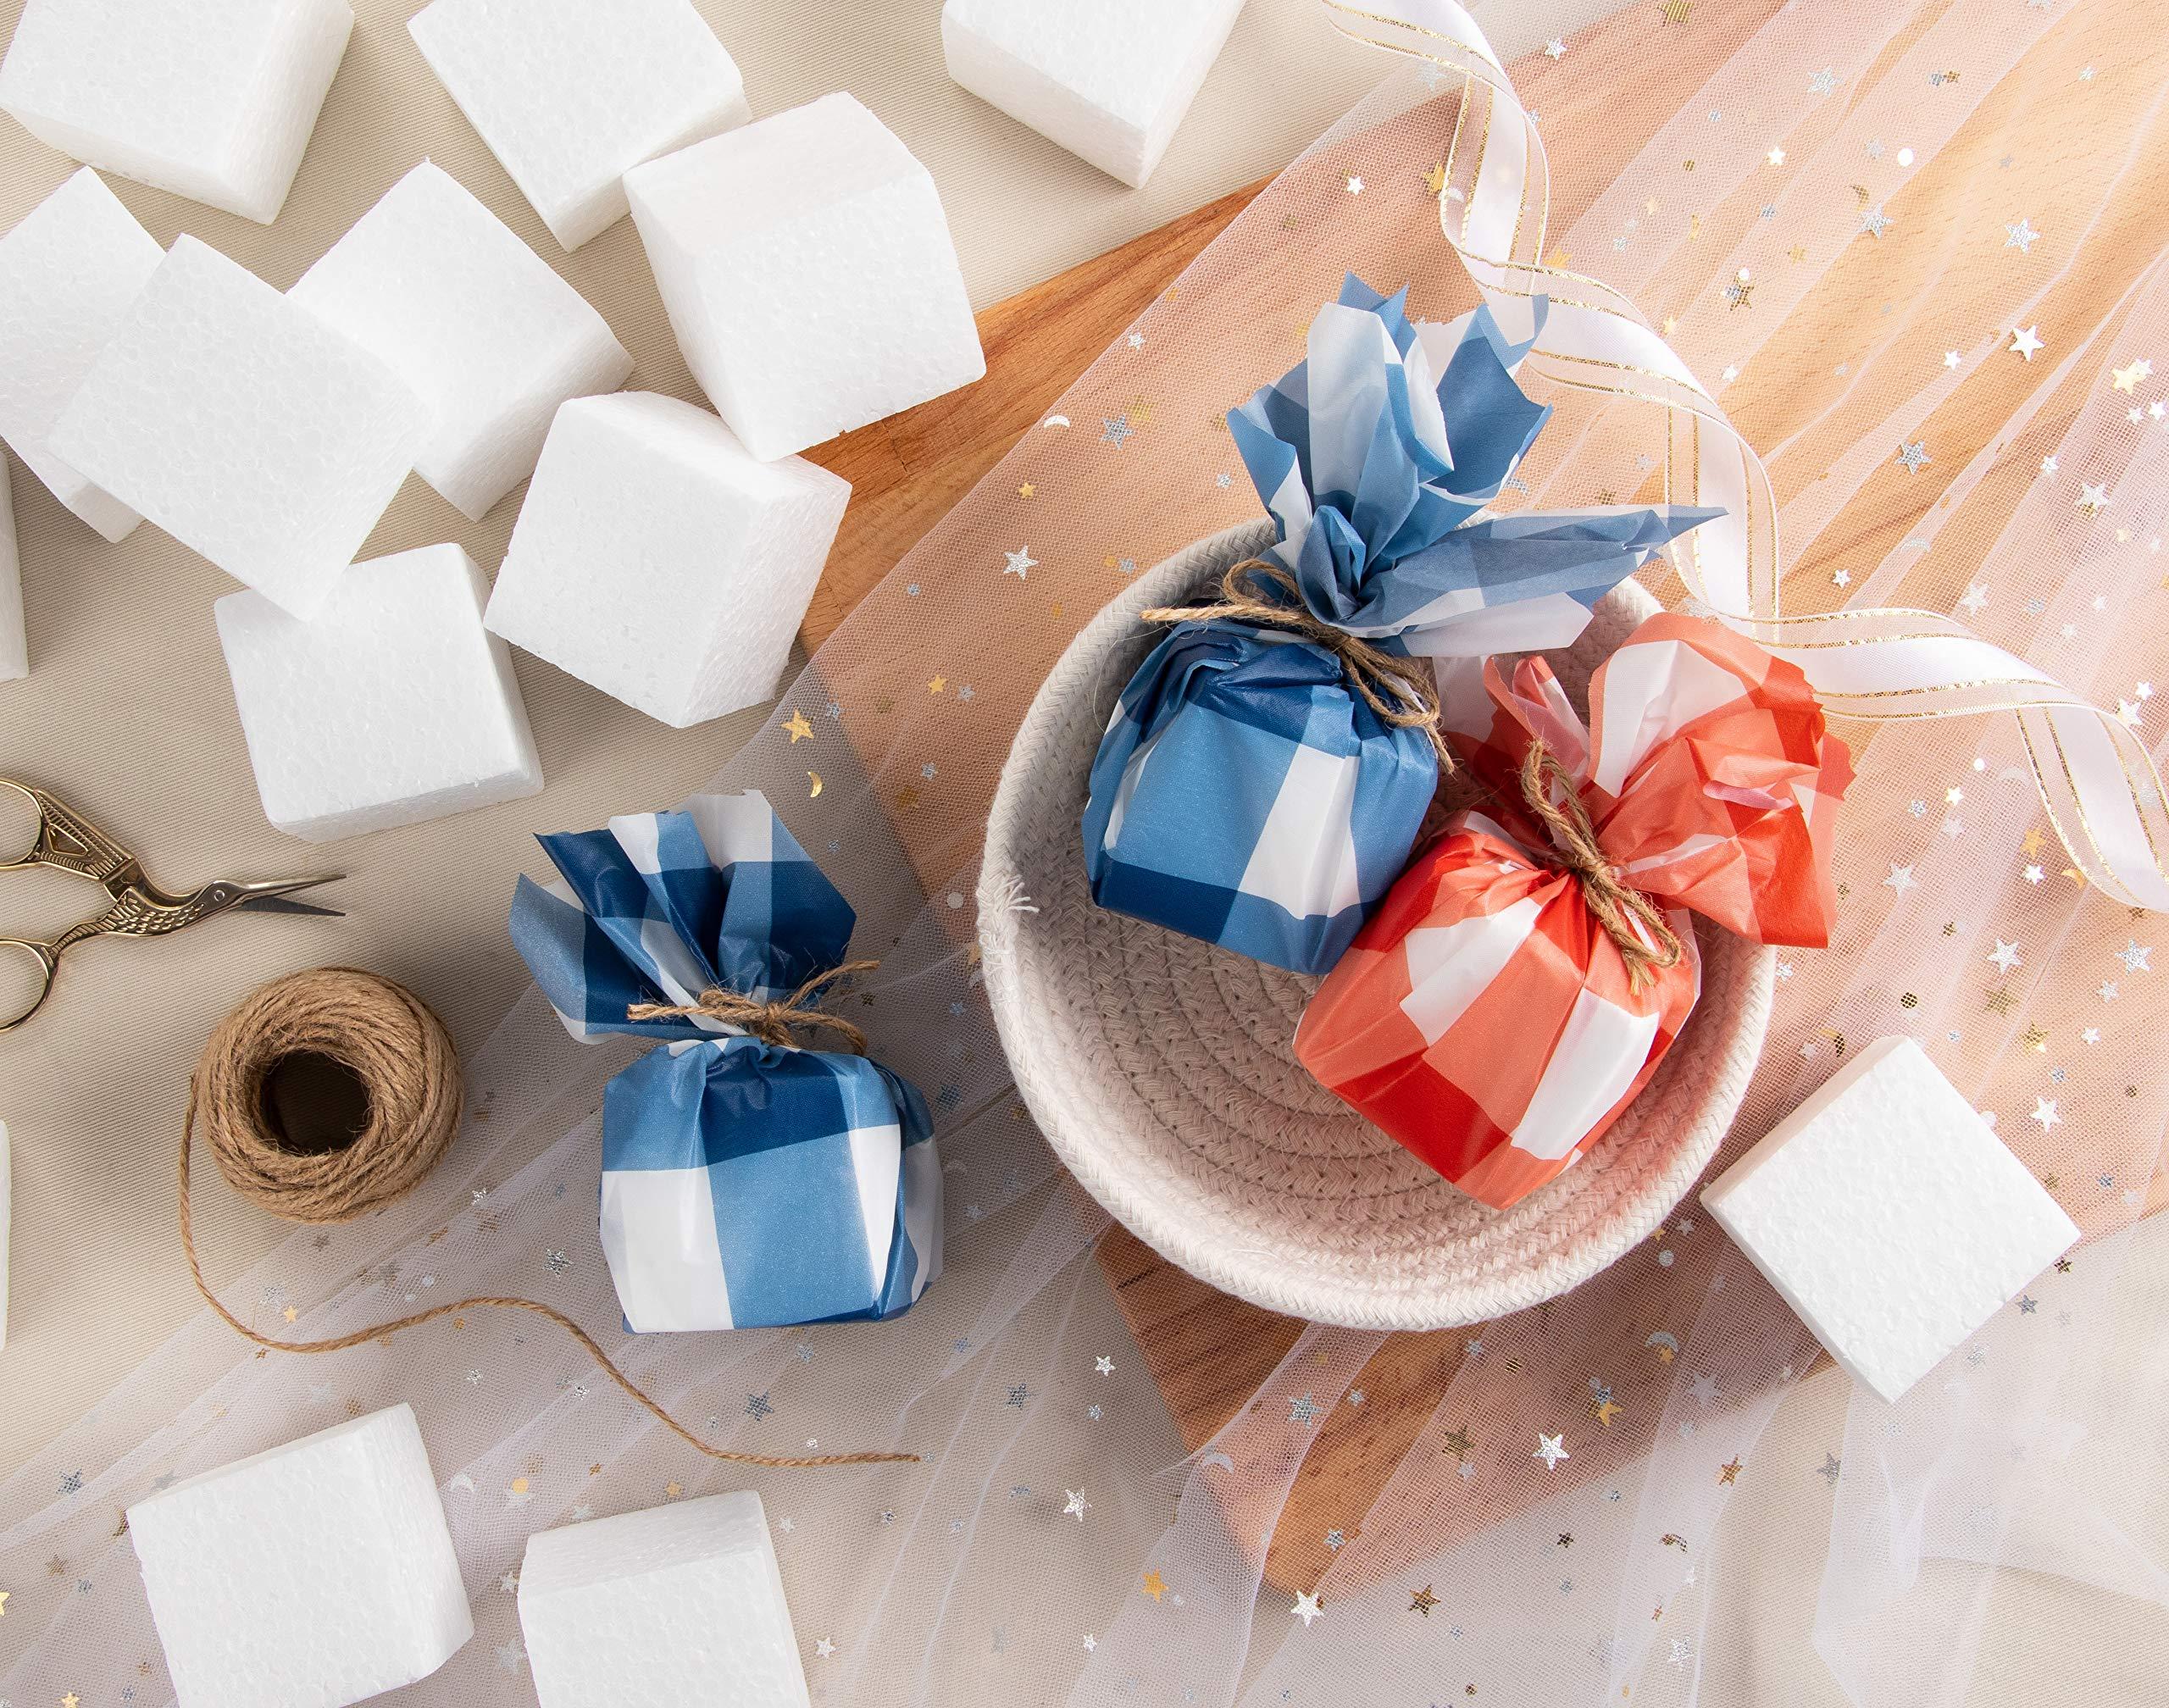 Craft Foam Blocks - 36-Piece Polystyrene Foam Blocks for Crafts and Modeling, 2 x 2 x 2 Inches Blank Craft Foam by Genie Crafts (Image #2)